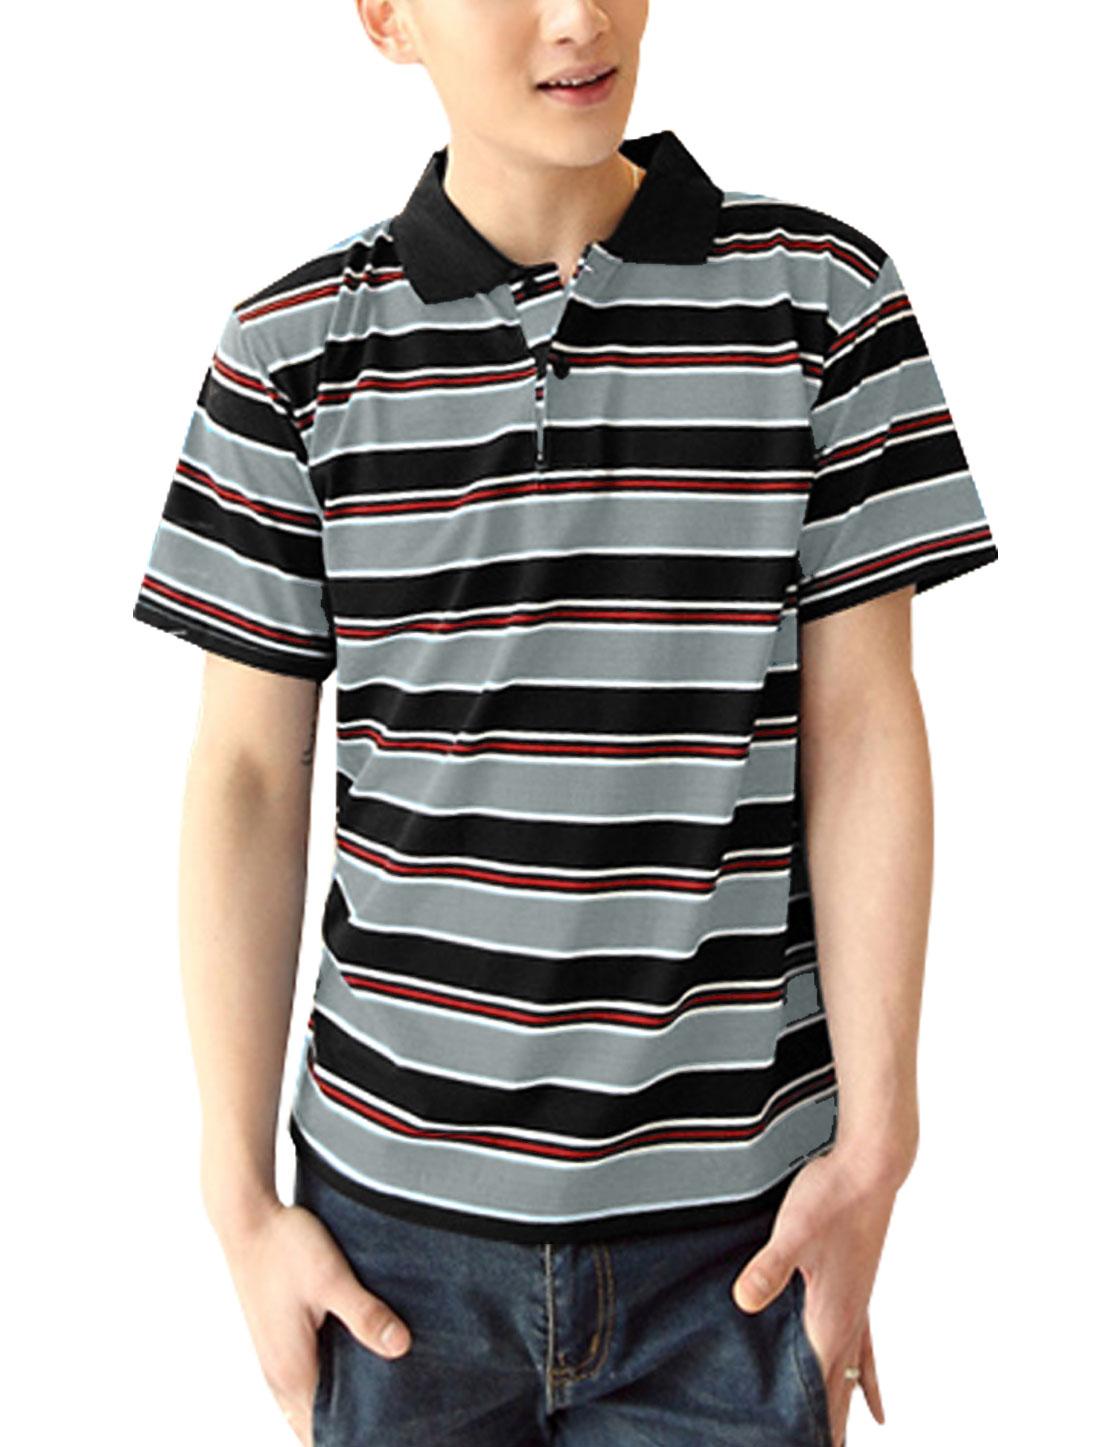 Men Stripes Pattern Two Buttons Closure Slim Fit Polo Shirt Black Light Gray M